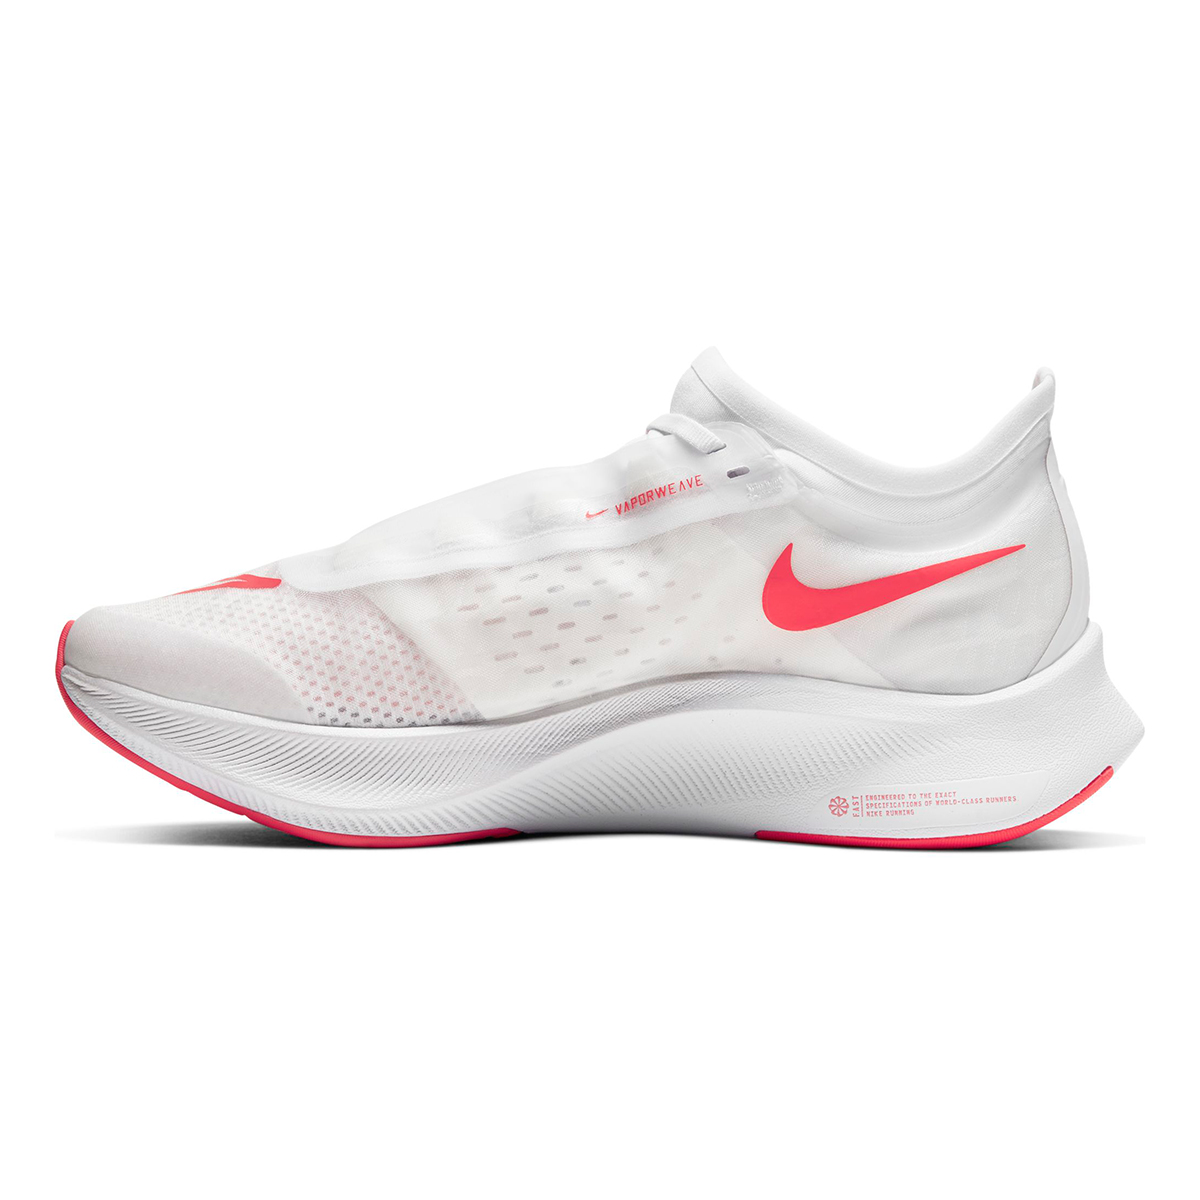 Women's Nike Zoom Fly 3 Running Shoes - Color: White/Laser Crimson/Summit White - Size: 5 - Width: Regular, White/Laser Crimson/Summit White, large, image 2